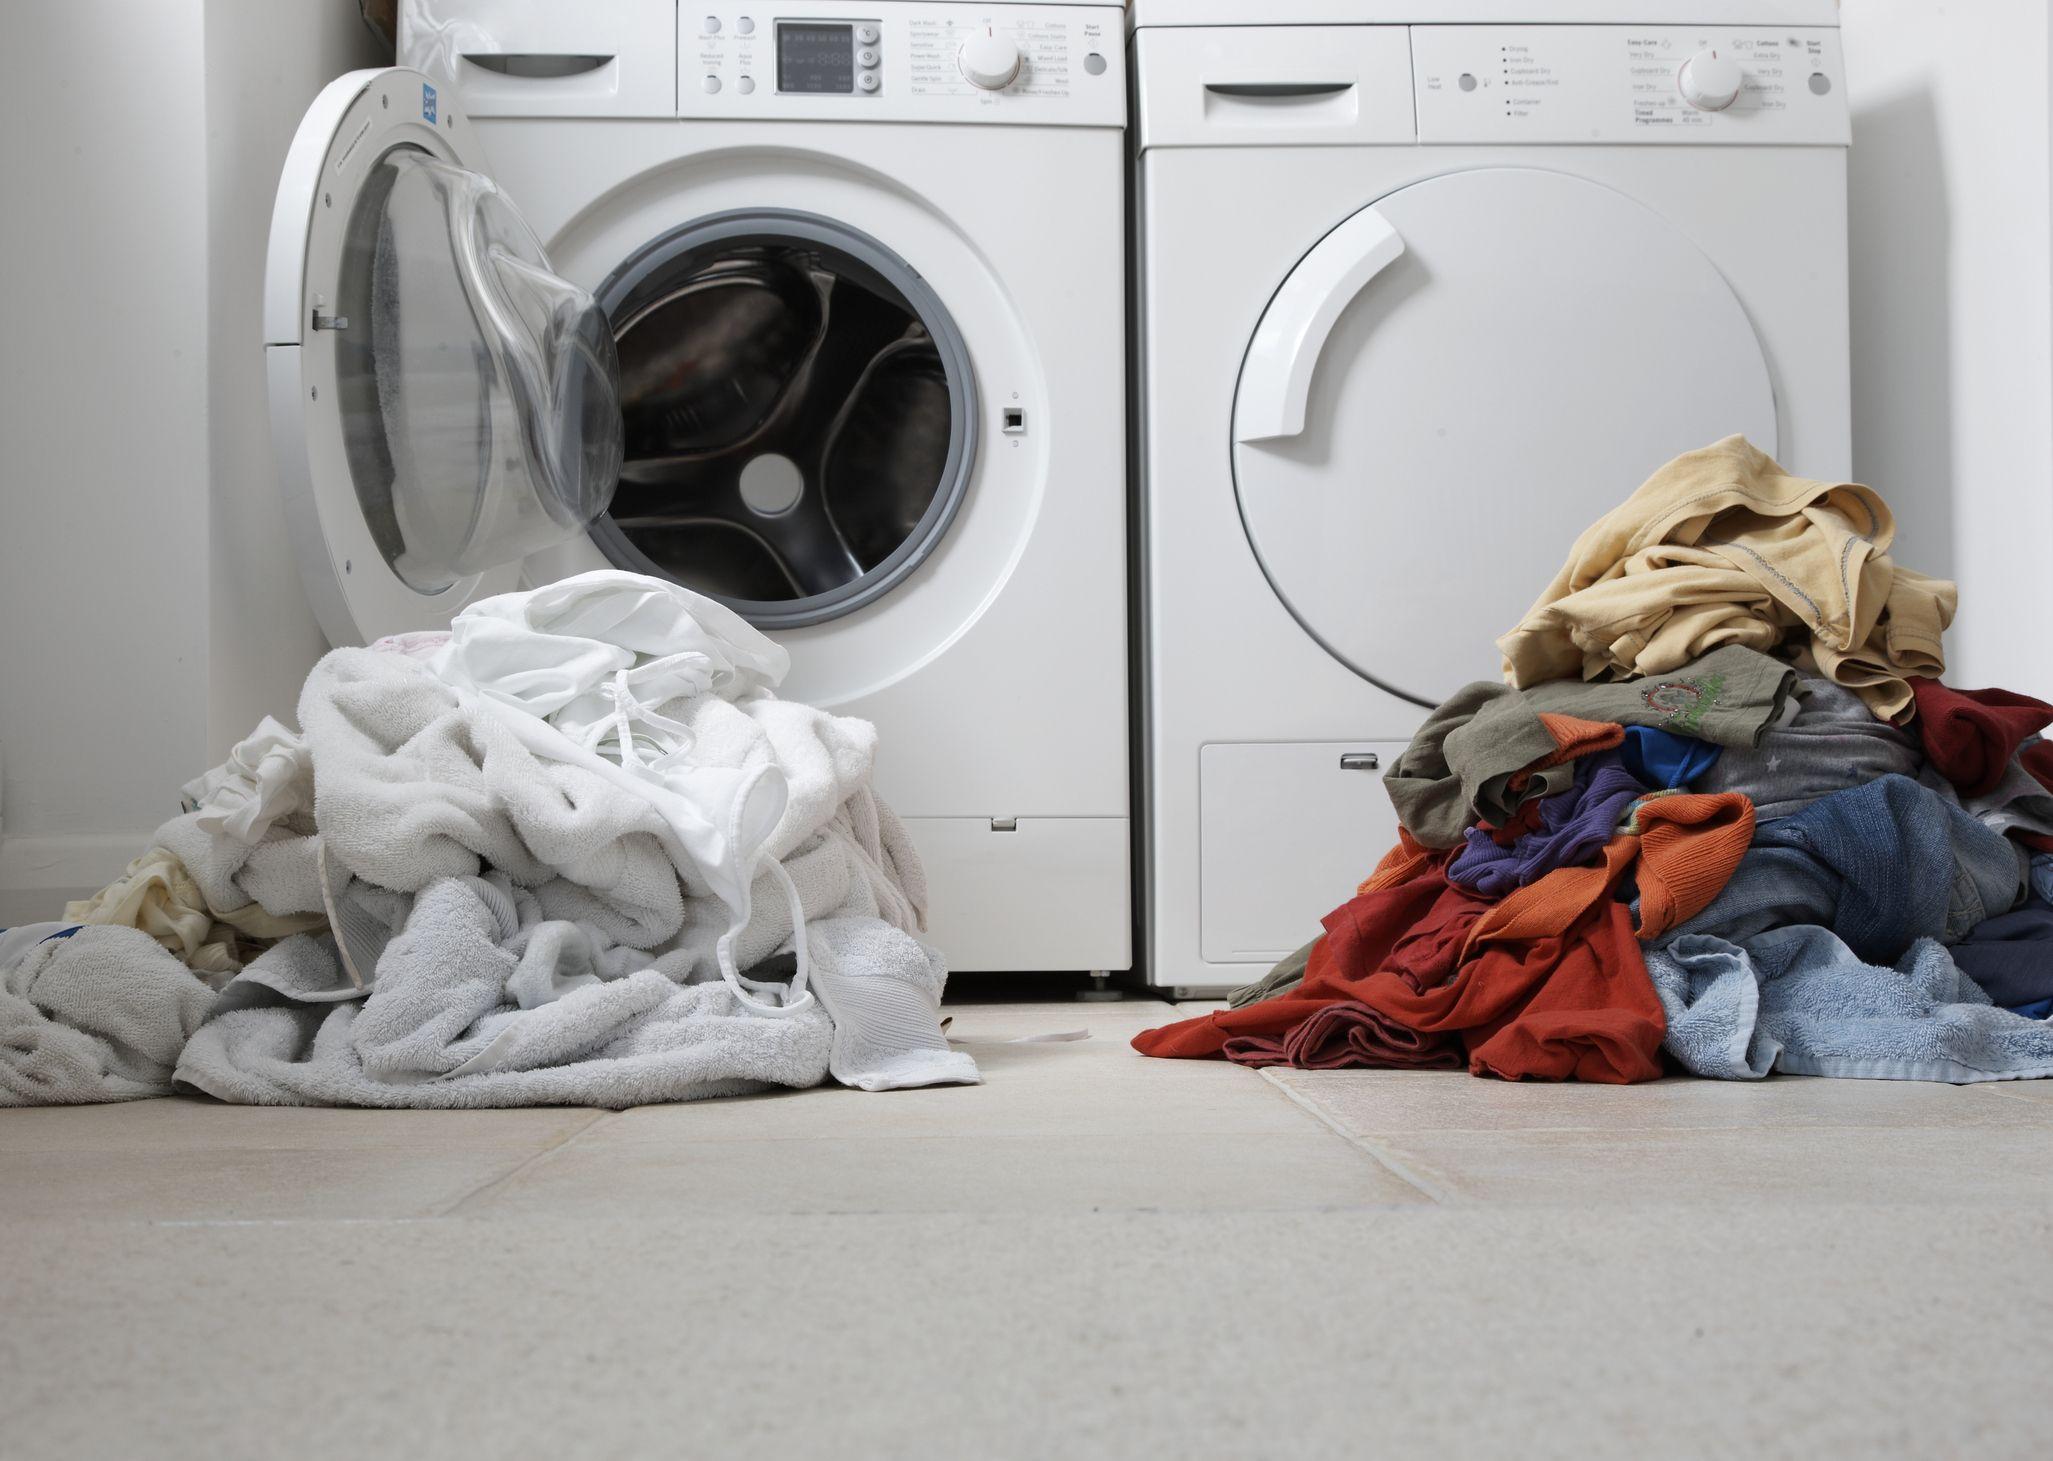 Separating laundry